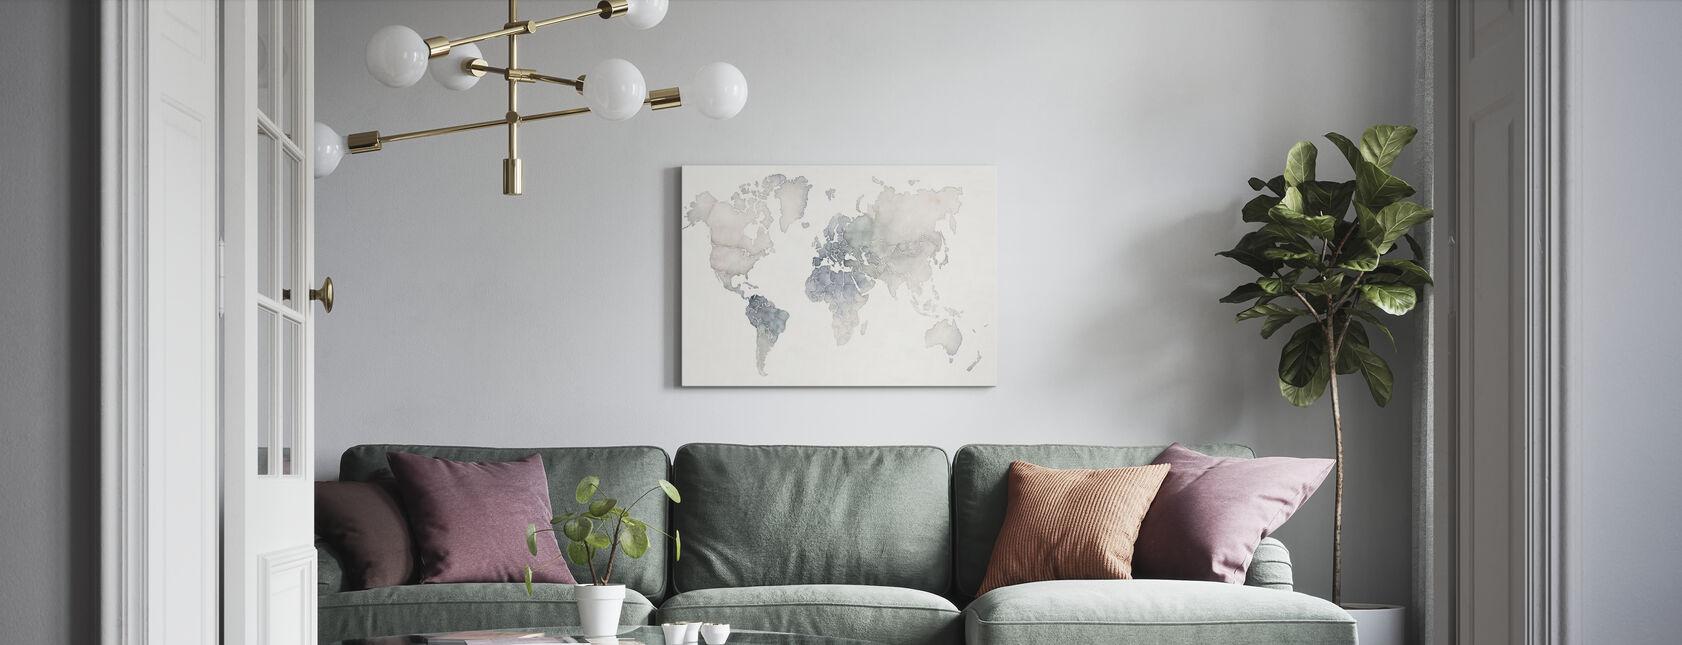 Watercolor Wanderlust - Canvas print - Living Room